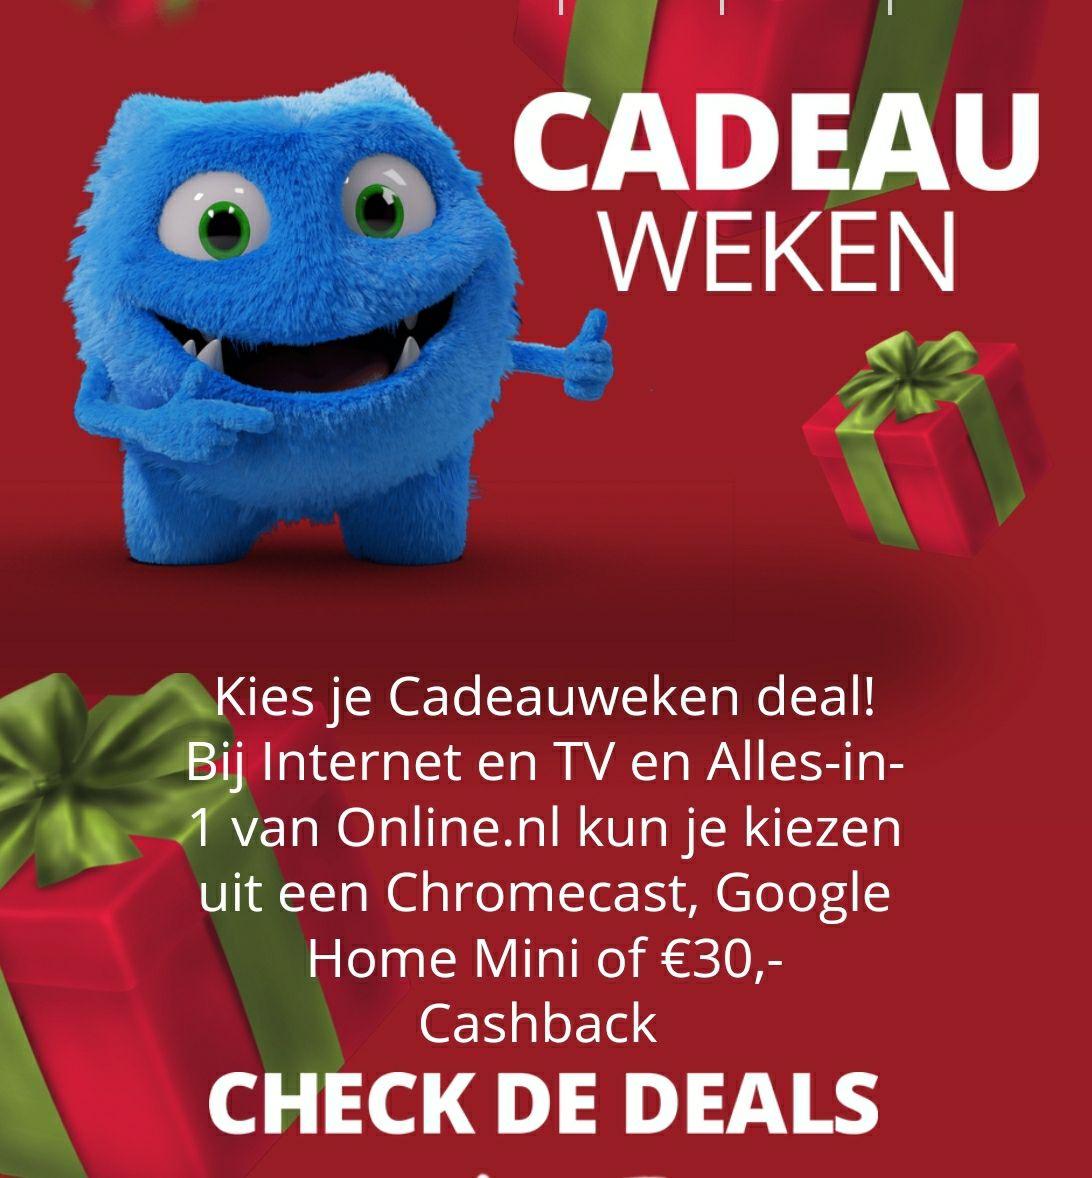 [Online.nl] Internet, TV & bellen Cadeau weken met keuze uit o.a. chromecast